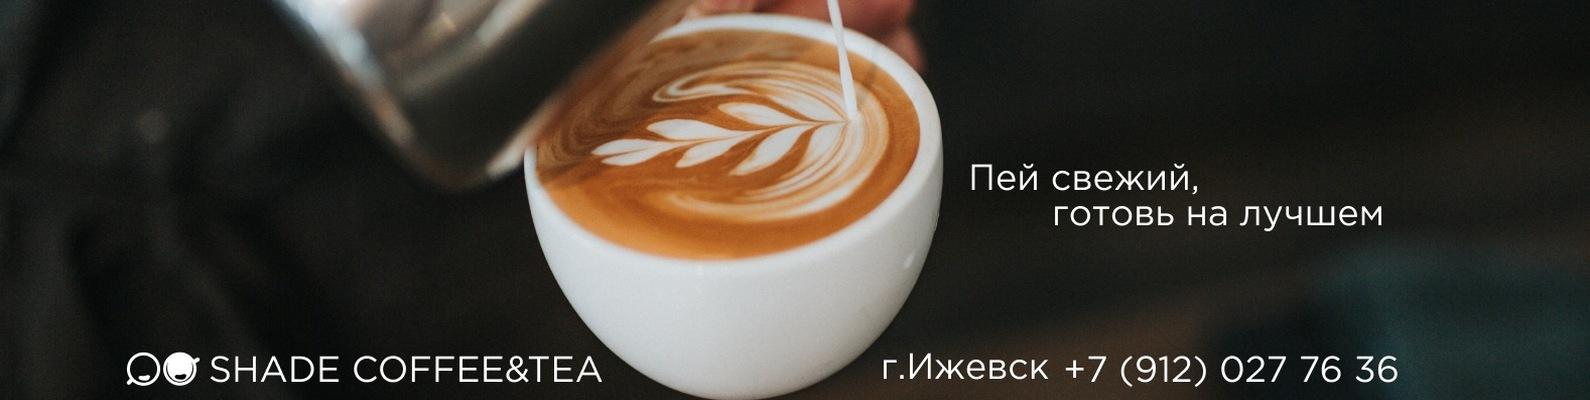 Кофе лавацца цена киев